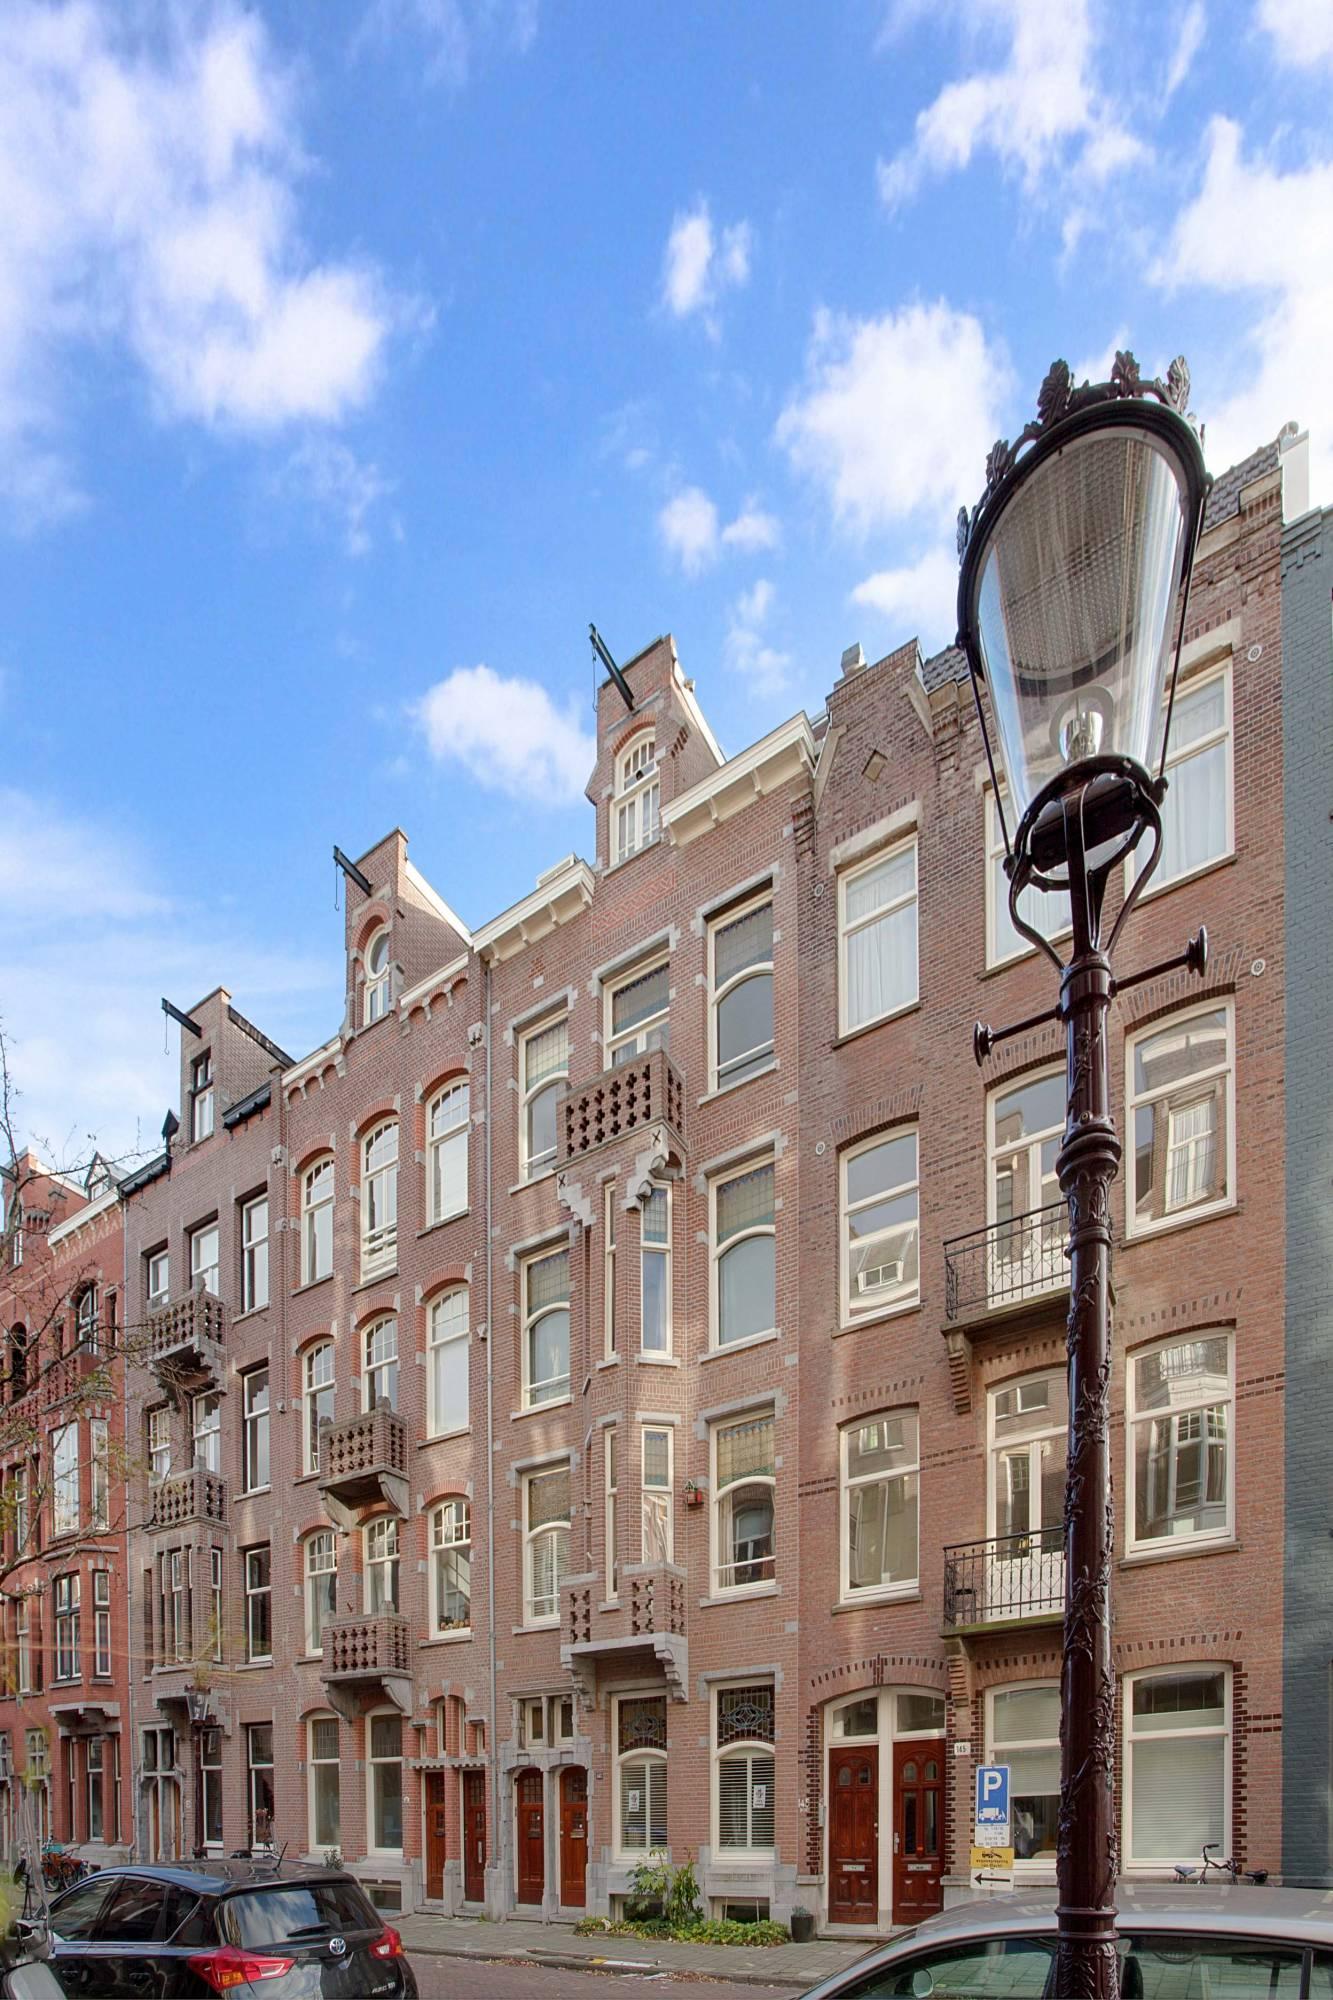 Valeriusstraat